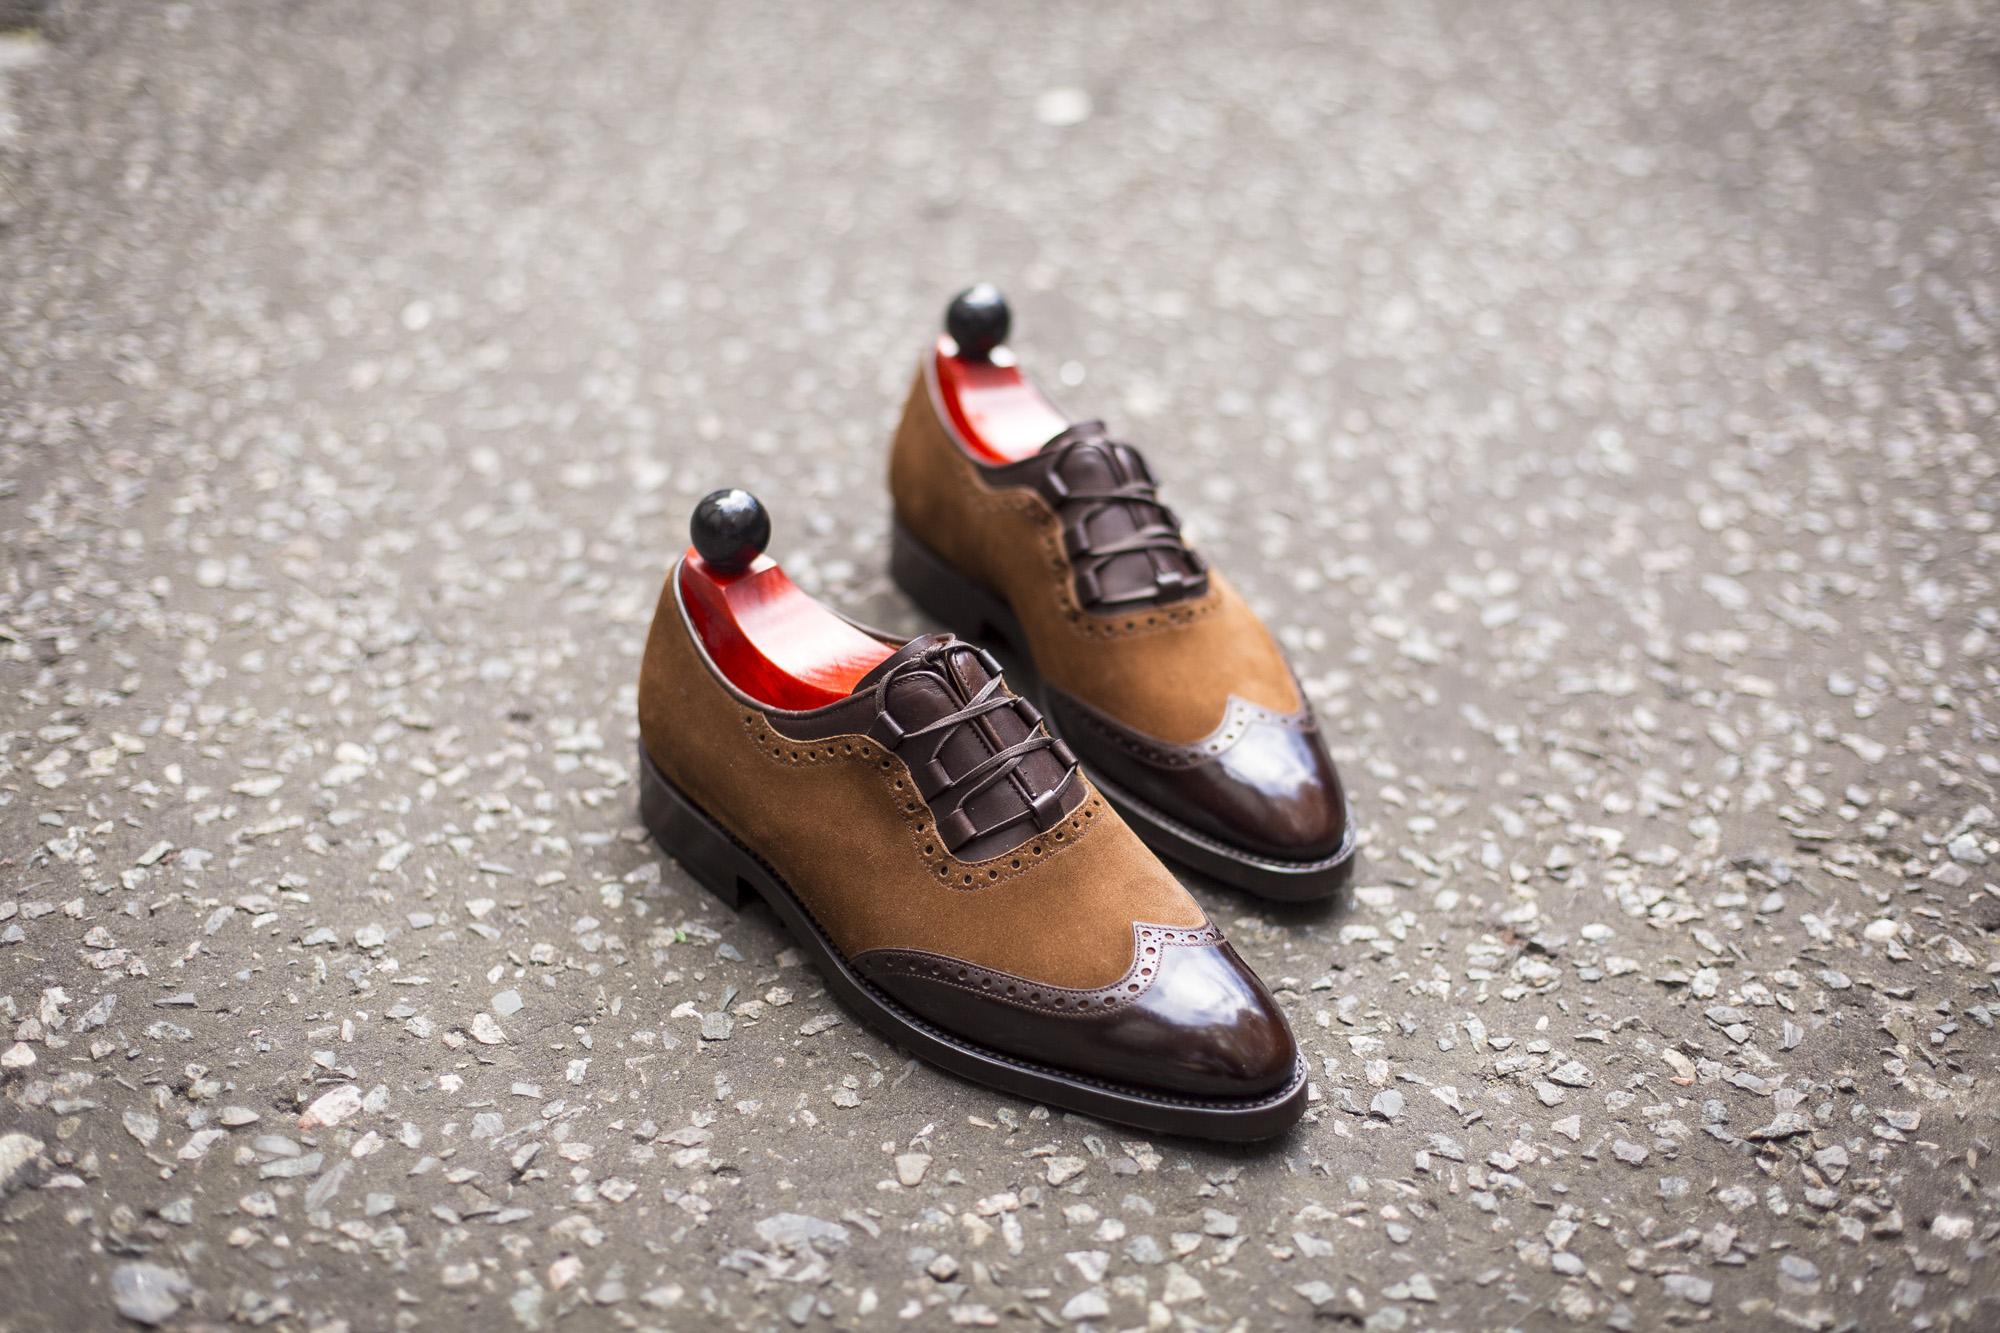 Discover the Leavenworth Ghillie - J.FitzPatrick Footwear